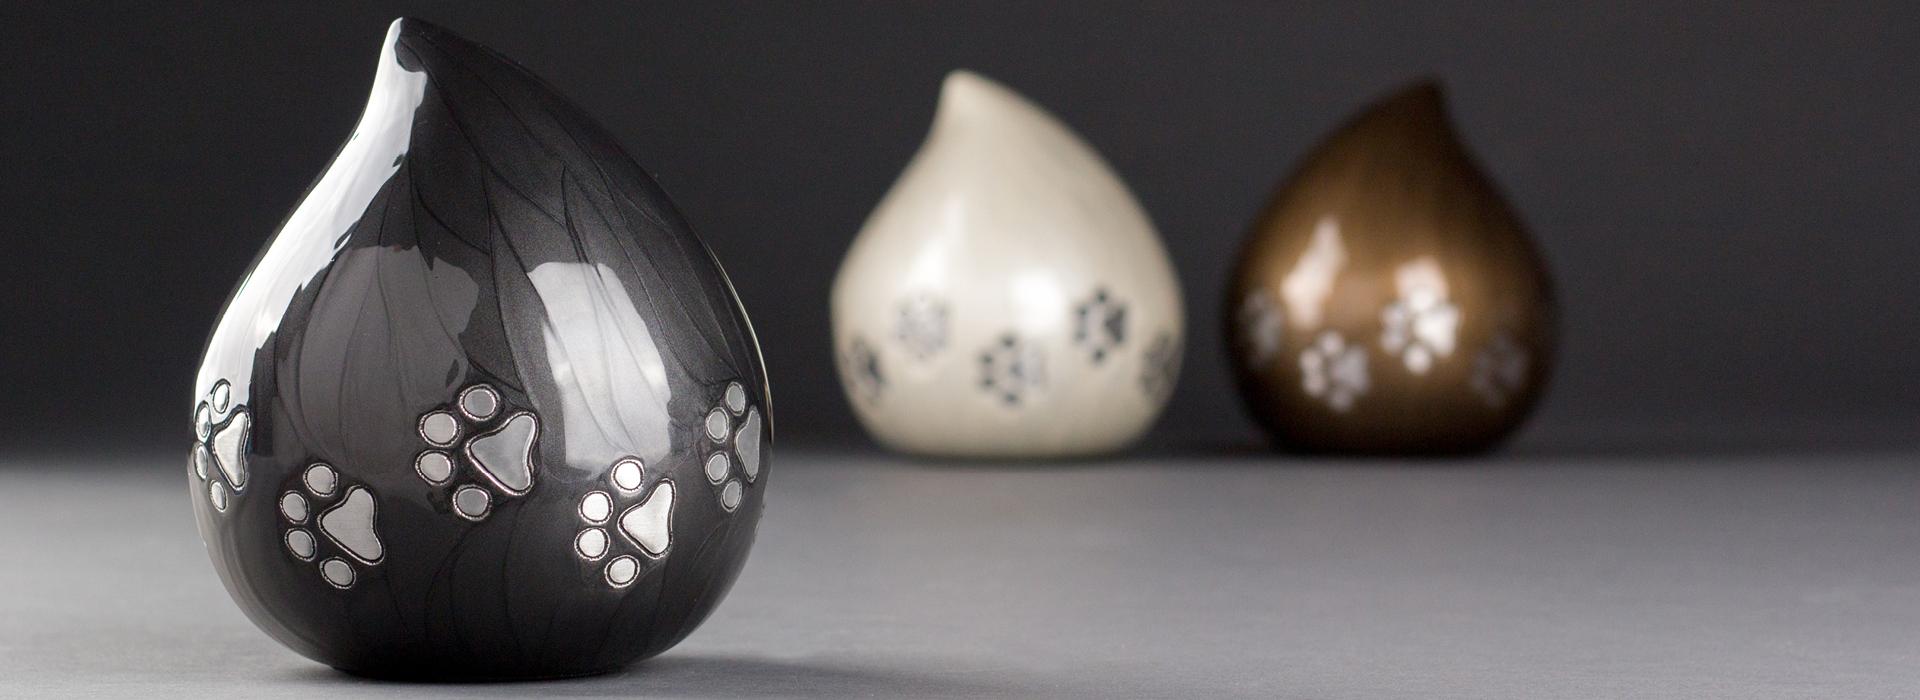 Urnen & Assieraden